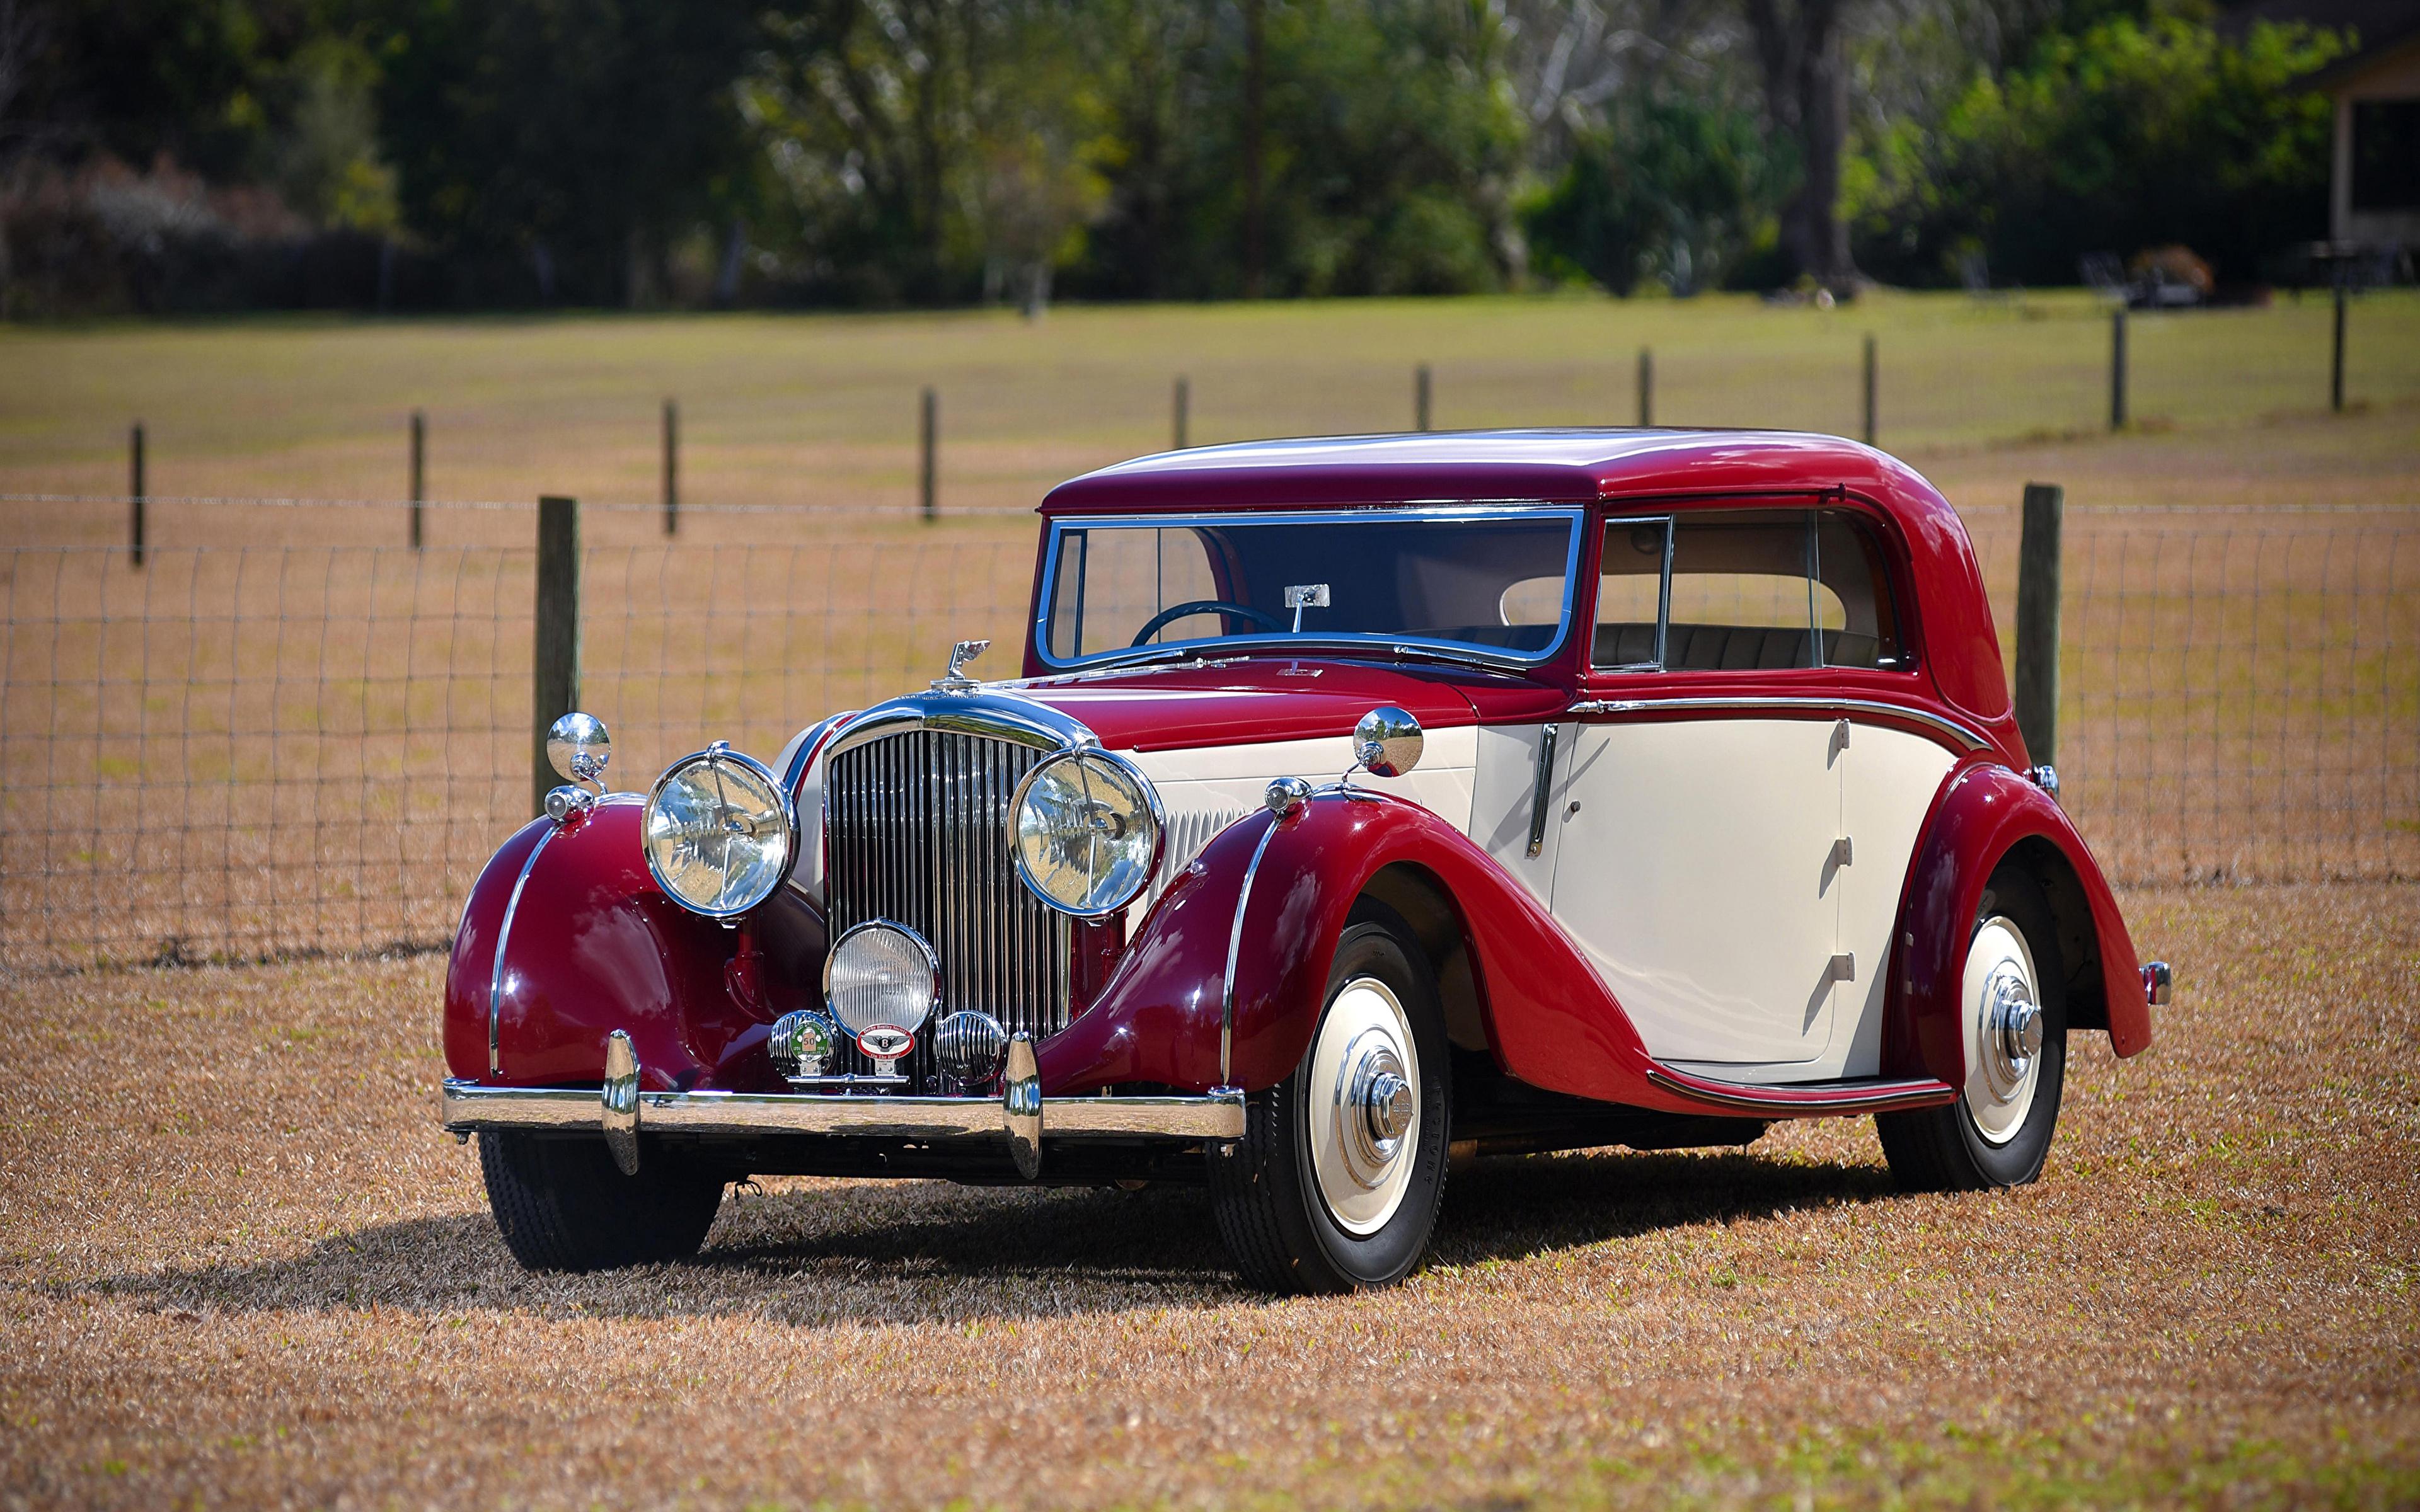 Картинка Бентли 1939 4 ¼ Litre Coupe by Park Ward винтаж Металлик Автомобили 3840x2400 Bentley Ретро старинные авто машины машина автомобиль